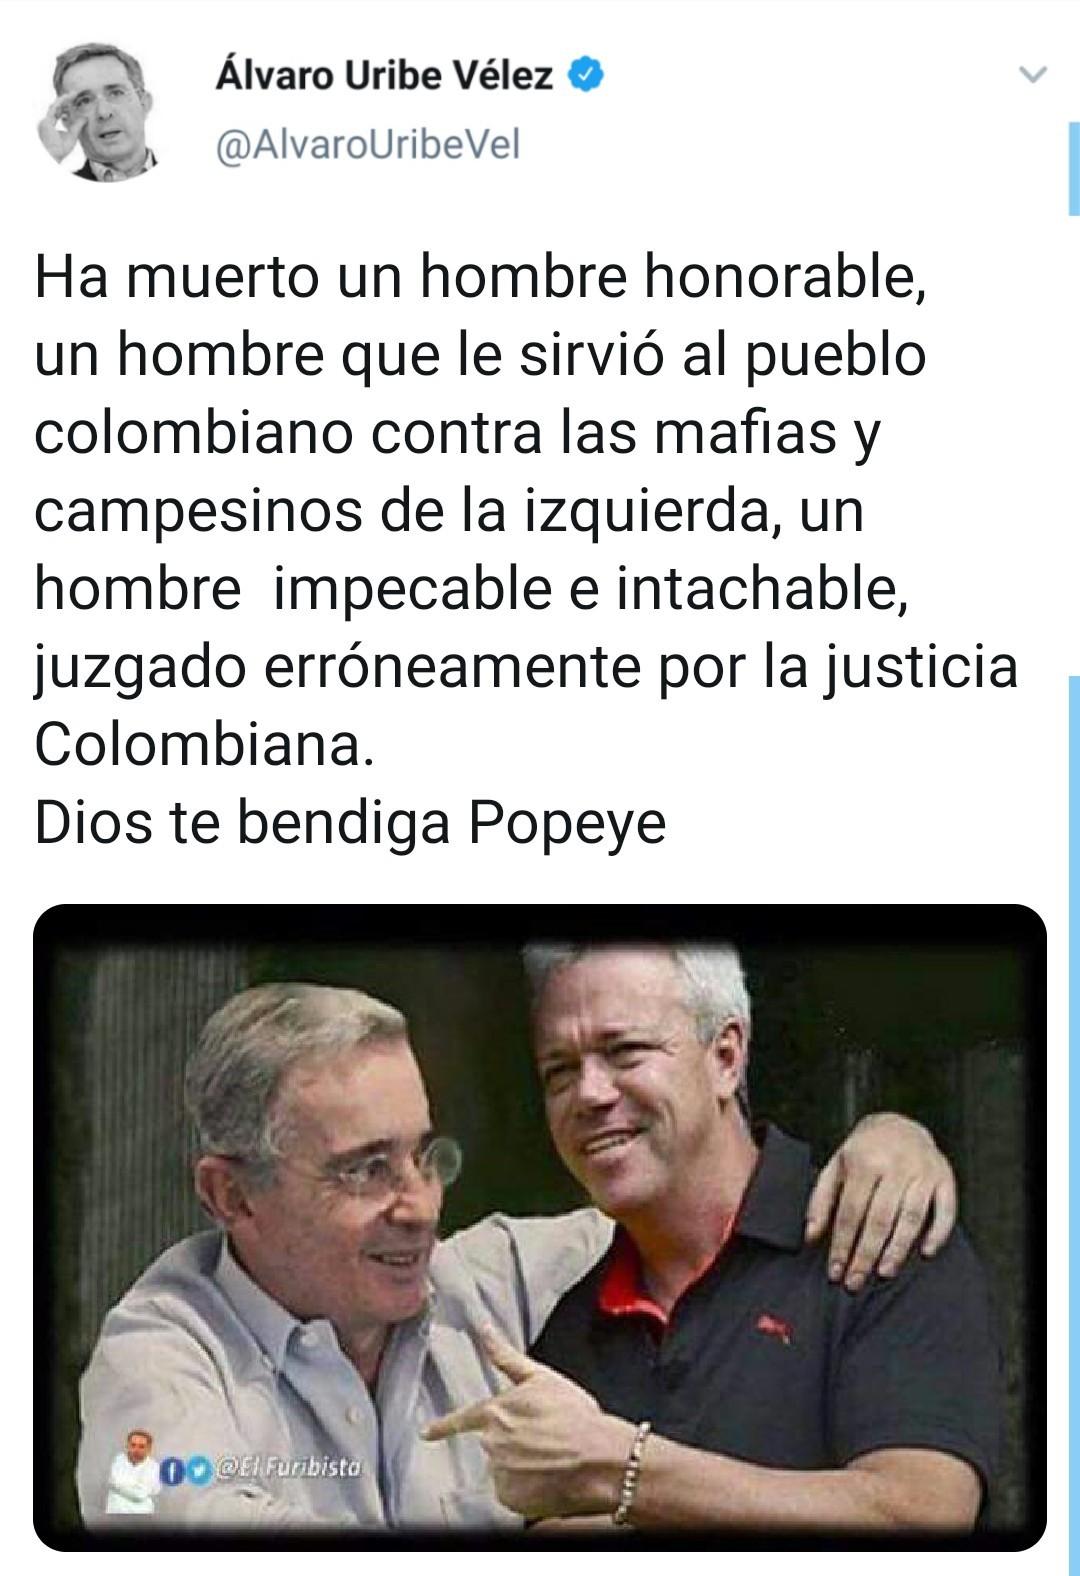 Uribe y popeye - meme